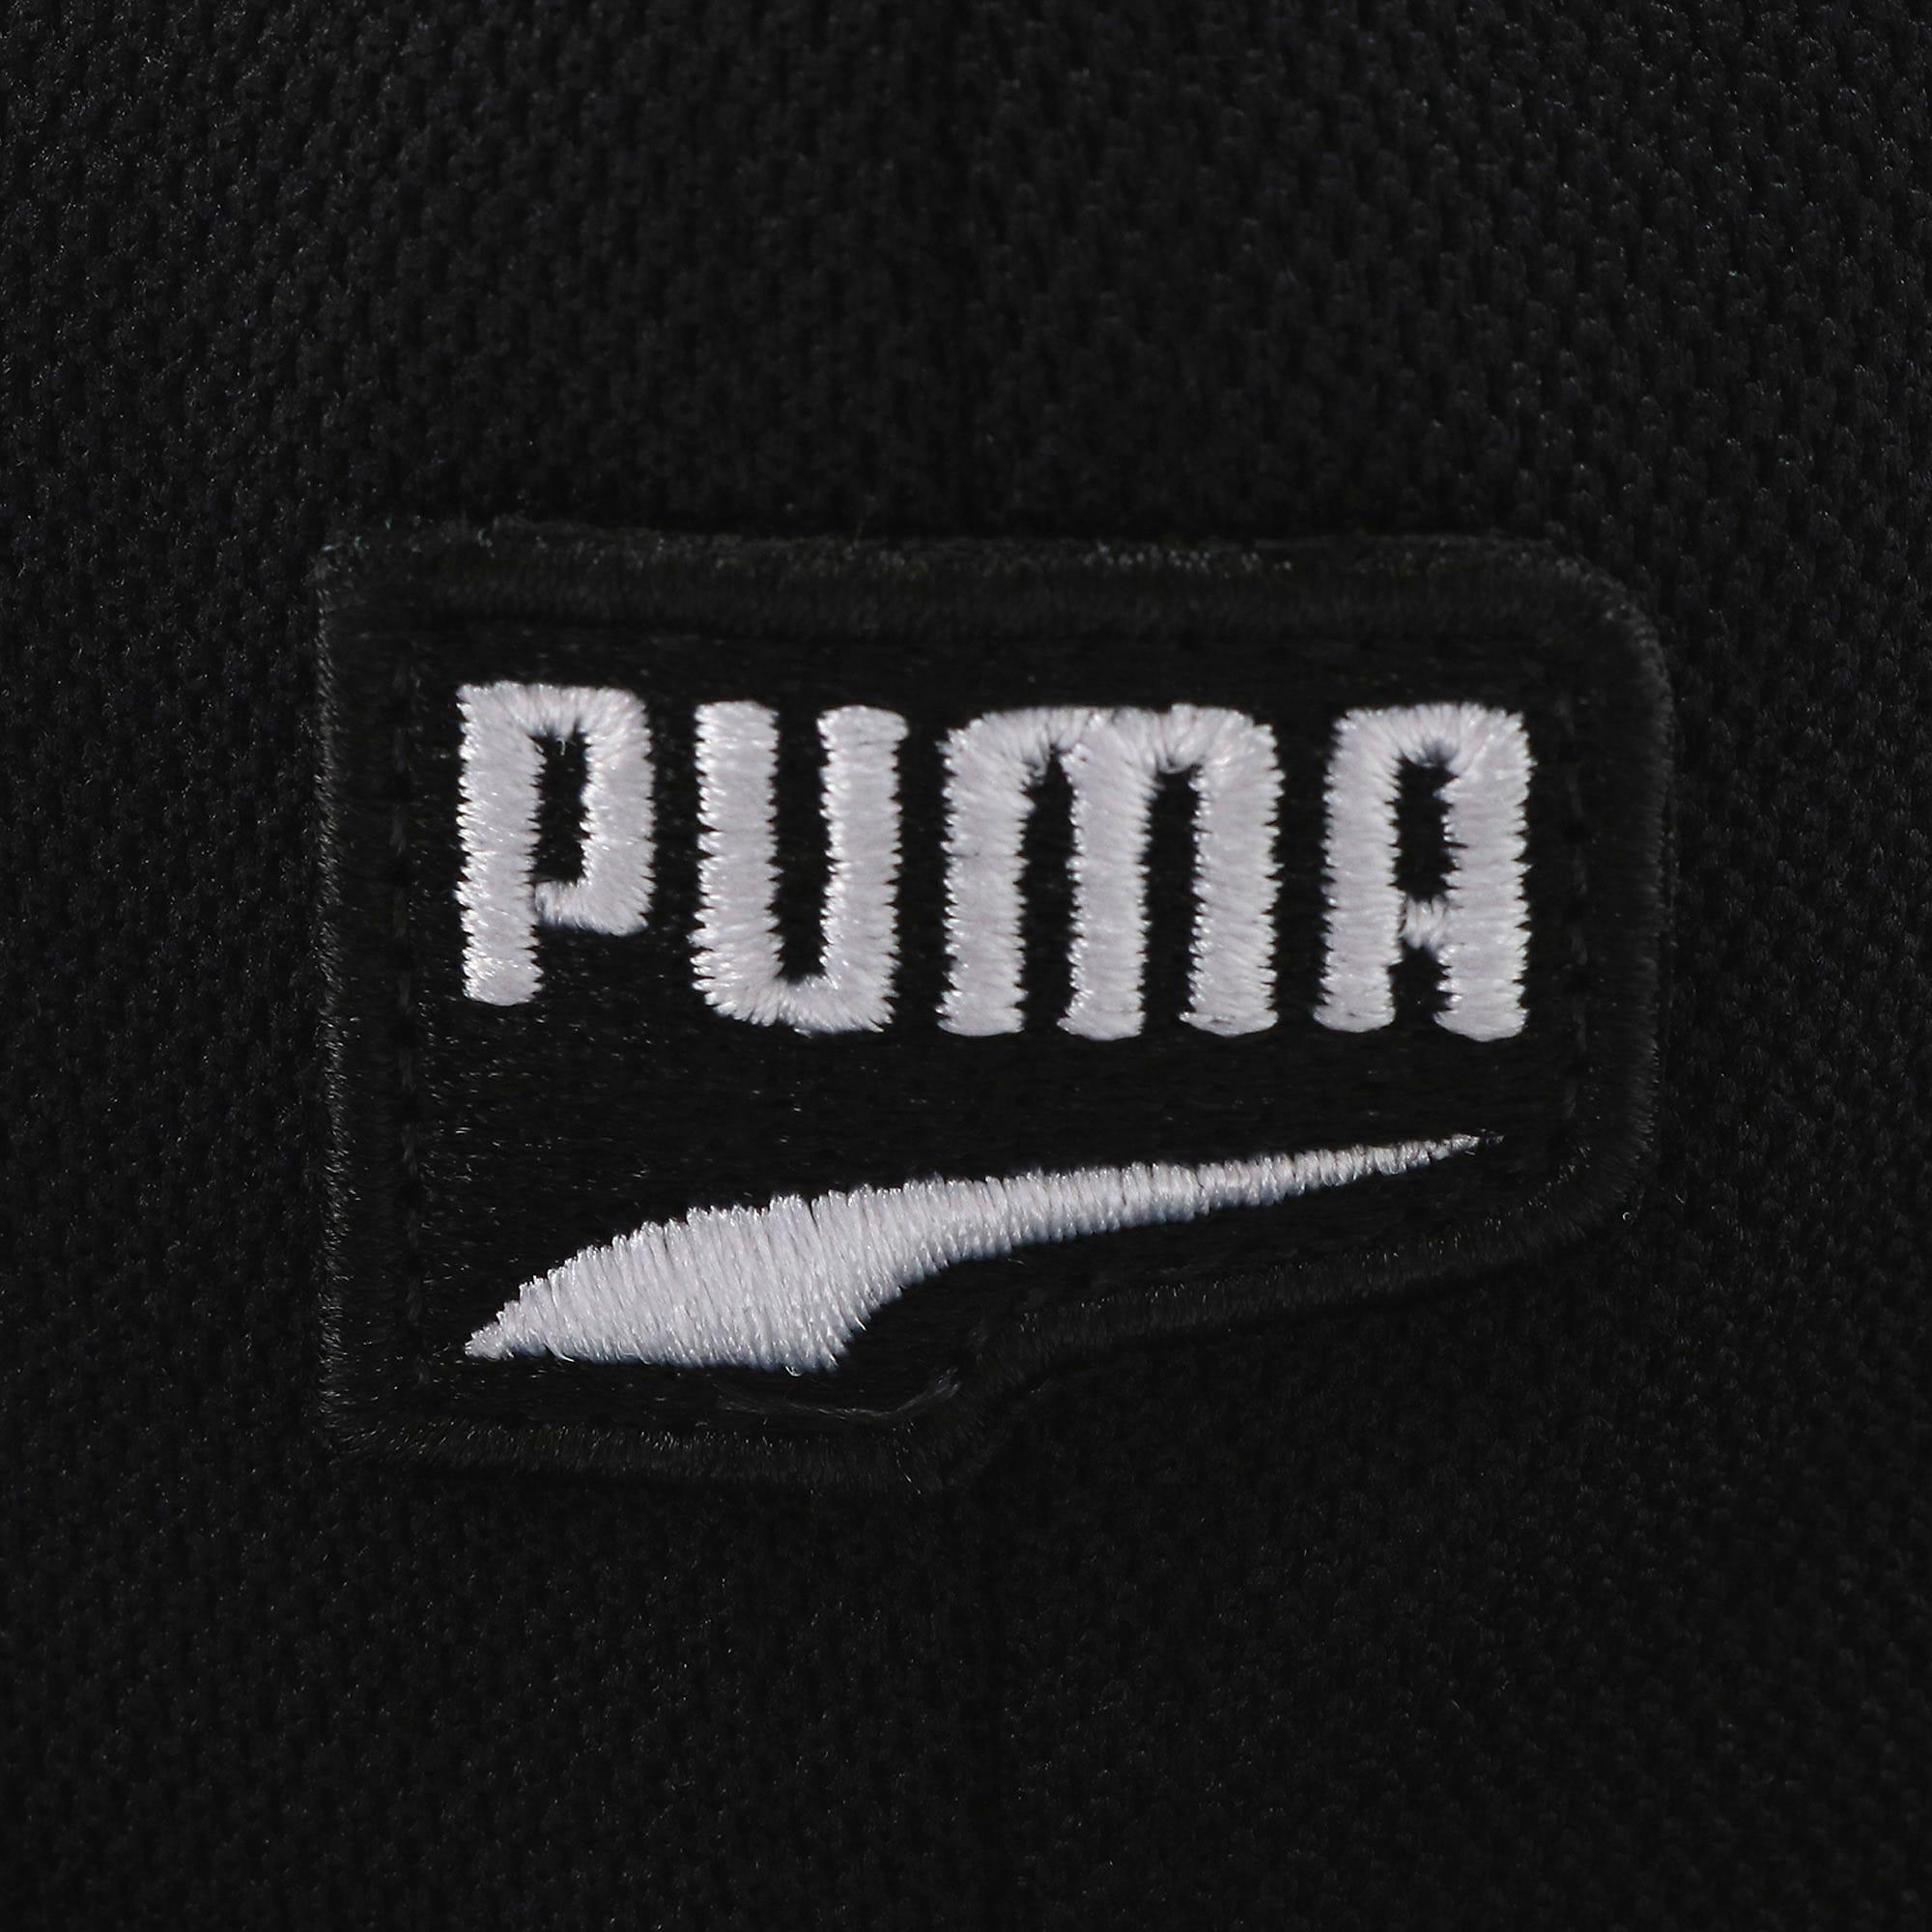 Thumbnail 5 of アーカイブ ダウンタウン FB キャップ, Puma Black, medium-JPN